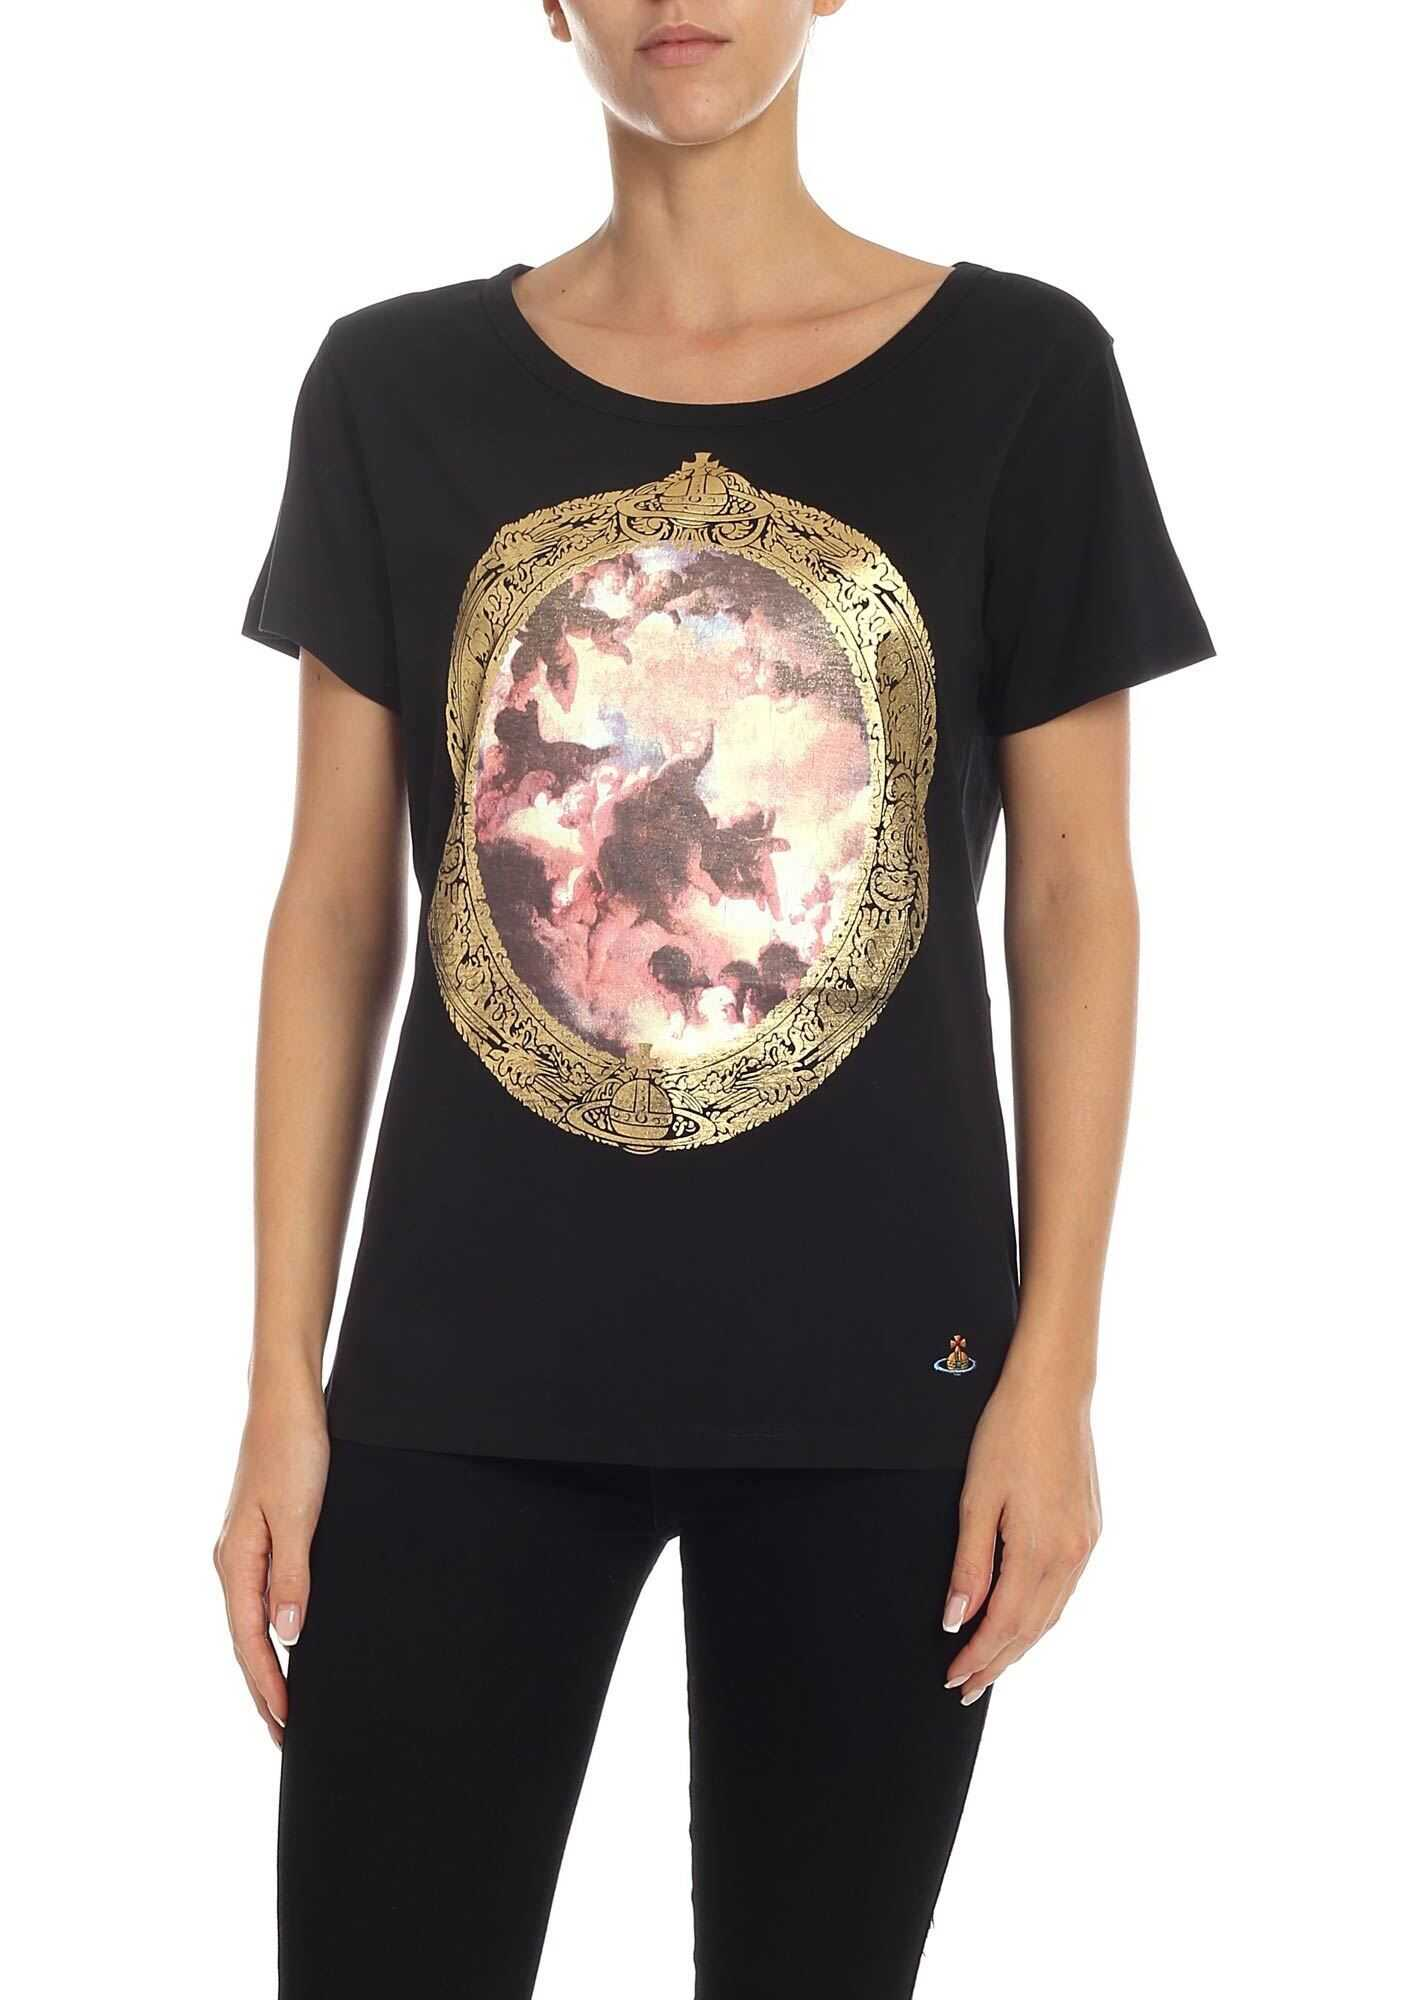 Vivienne Westwood Cotton T-Shirt With Putti Print Black